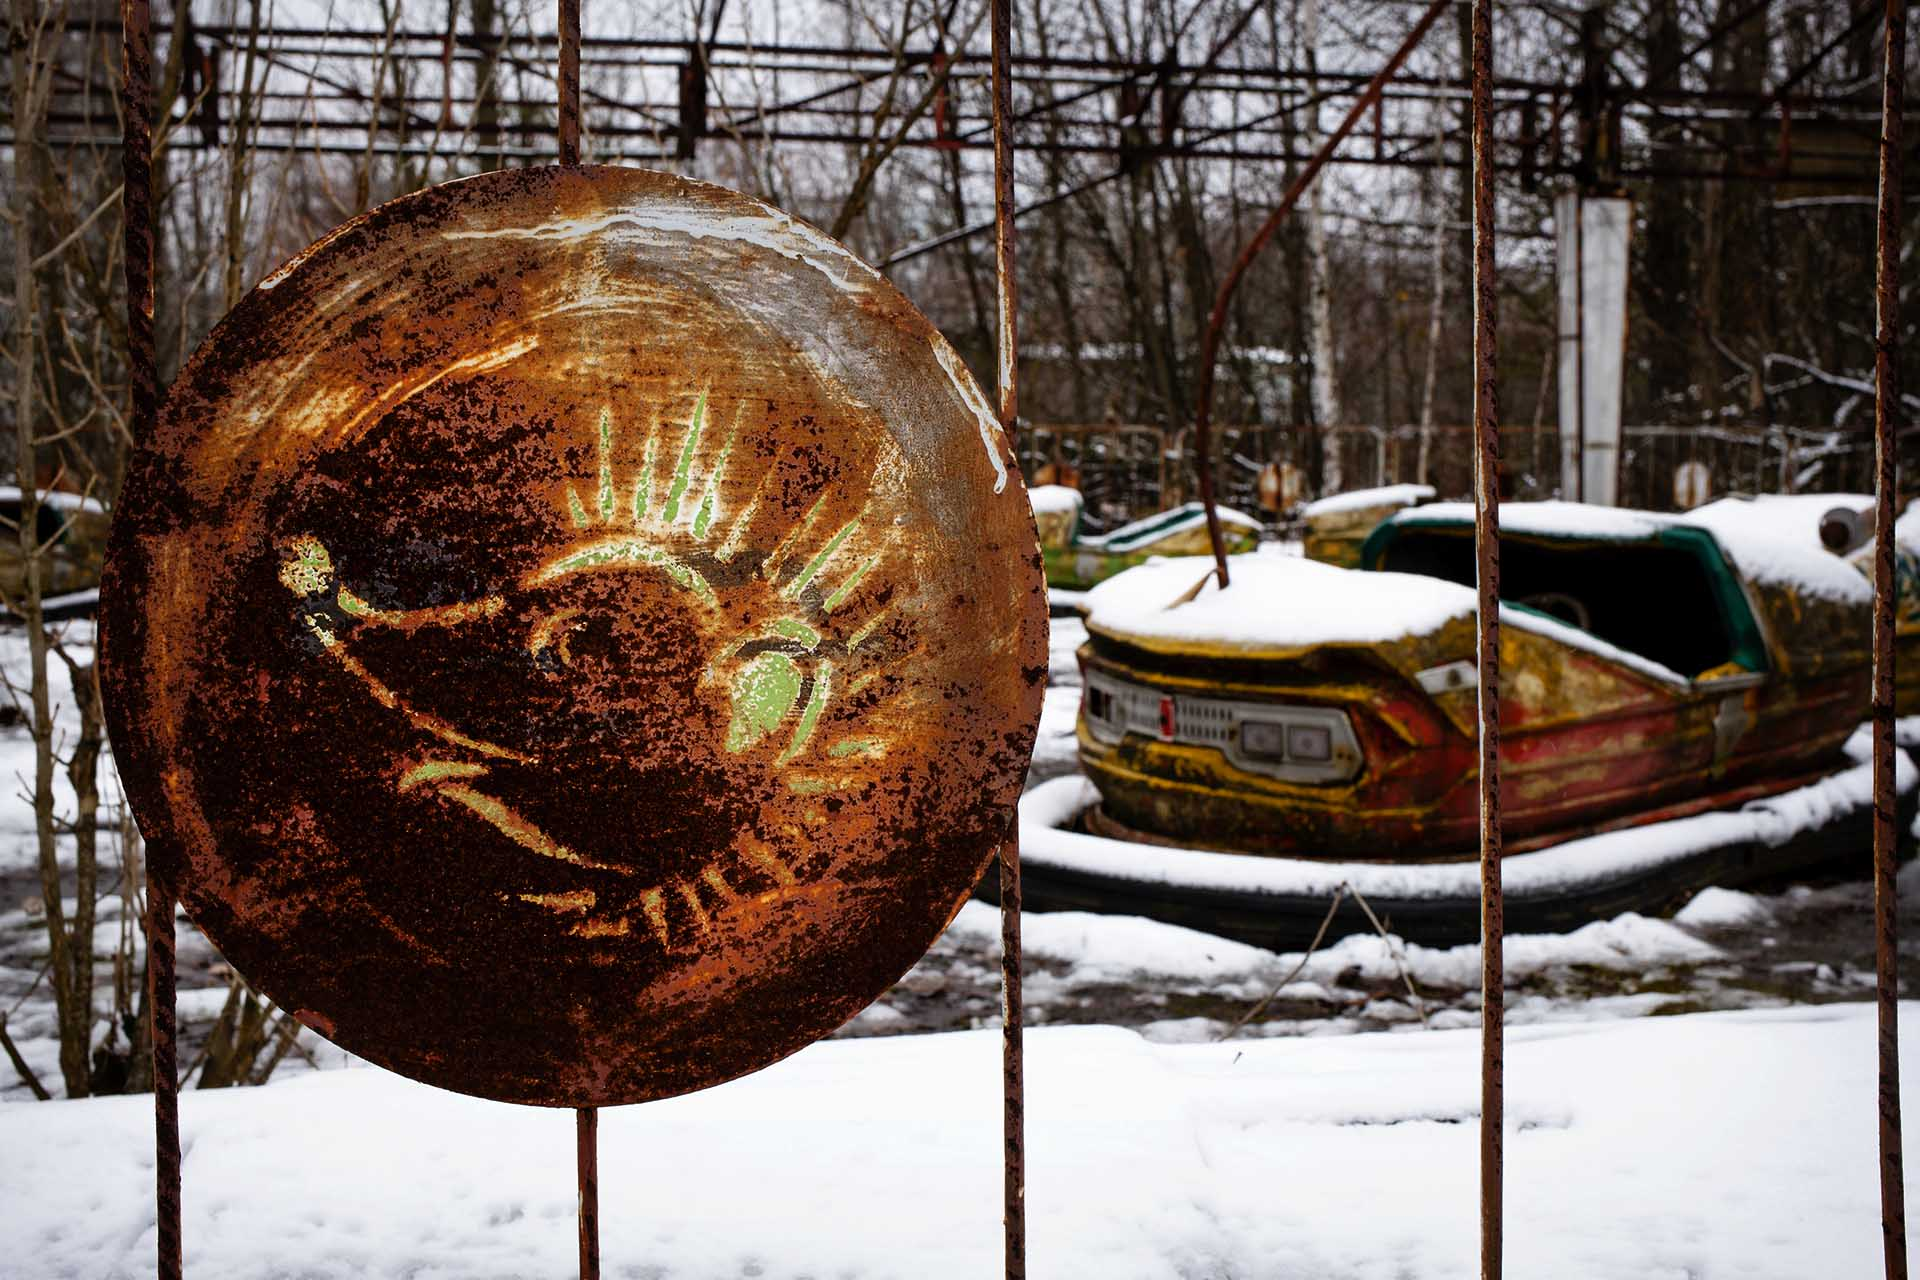 Un famoso personaje infantil soviético en los coches de choque del parque.